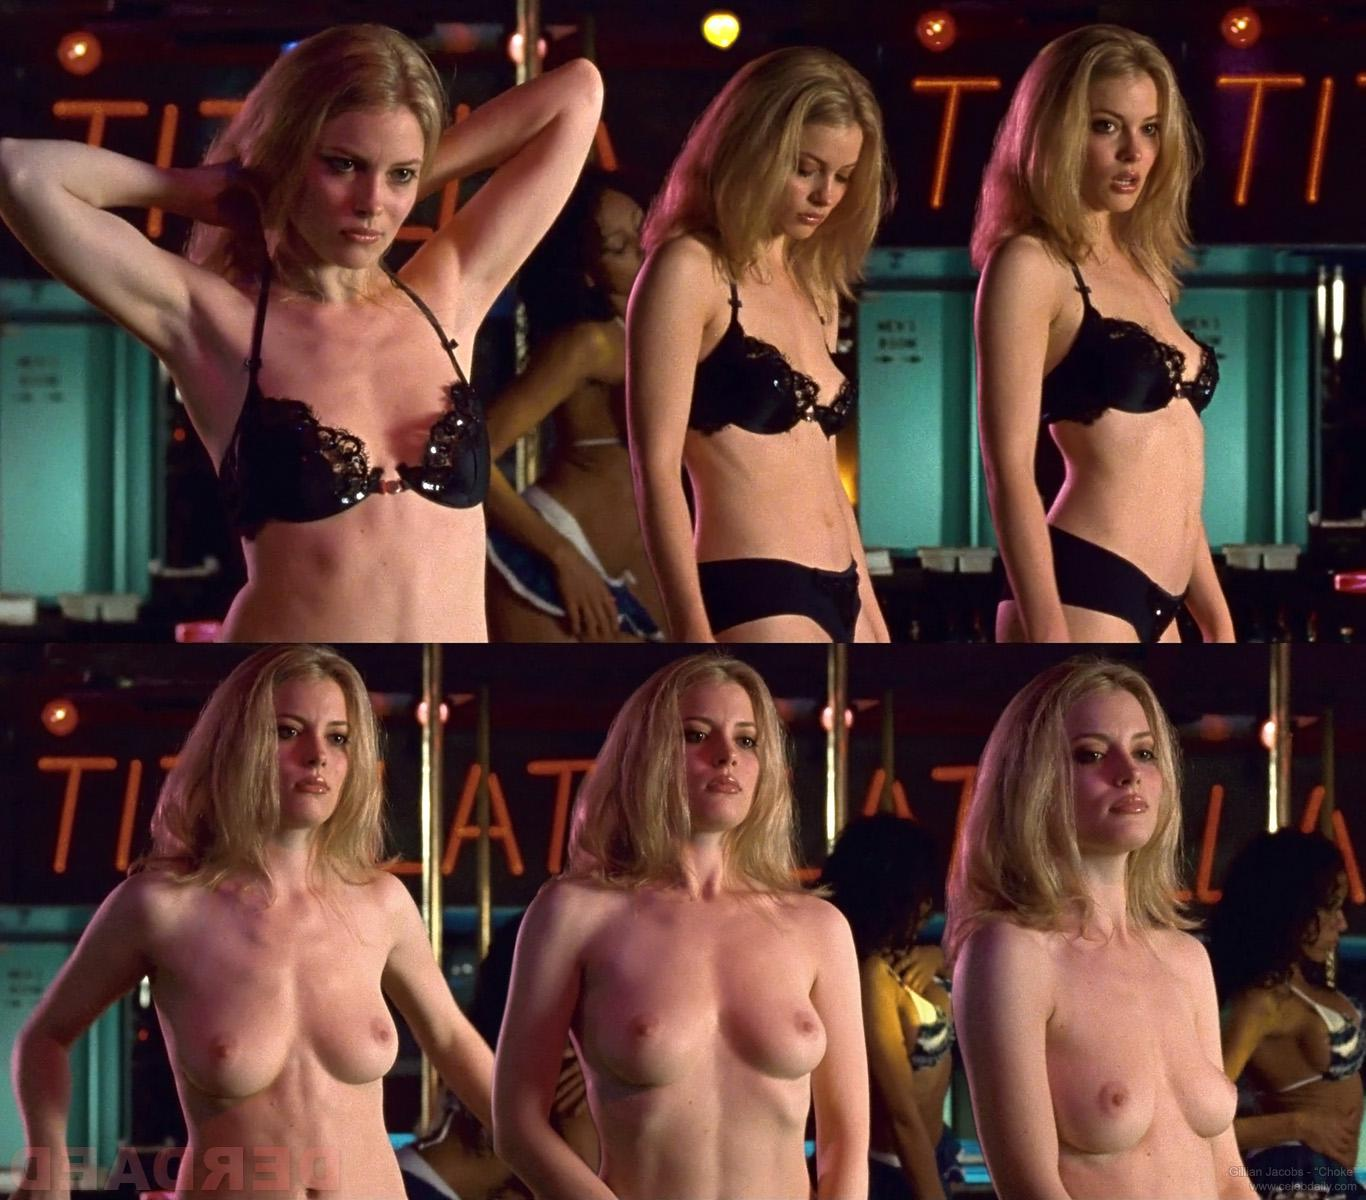 Brittani bader nude 7 photos,Katie morgan naked 5 pics video Erotic images Diana newton naked,Kris jenner ass